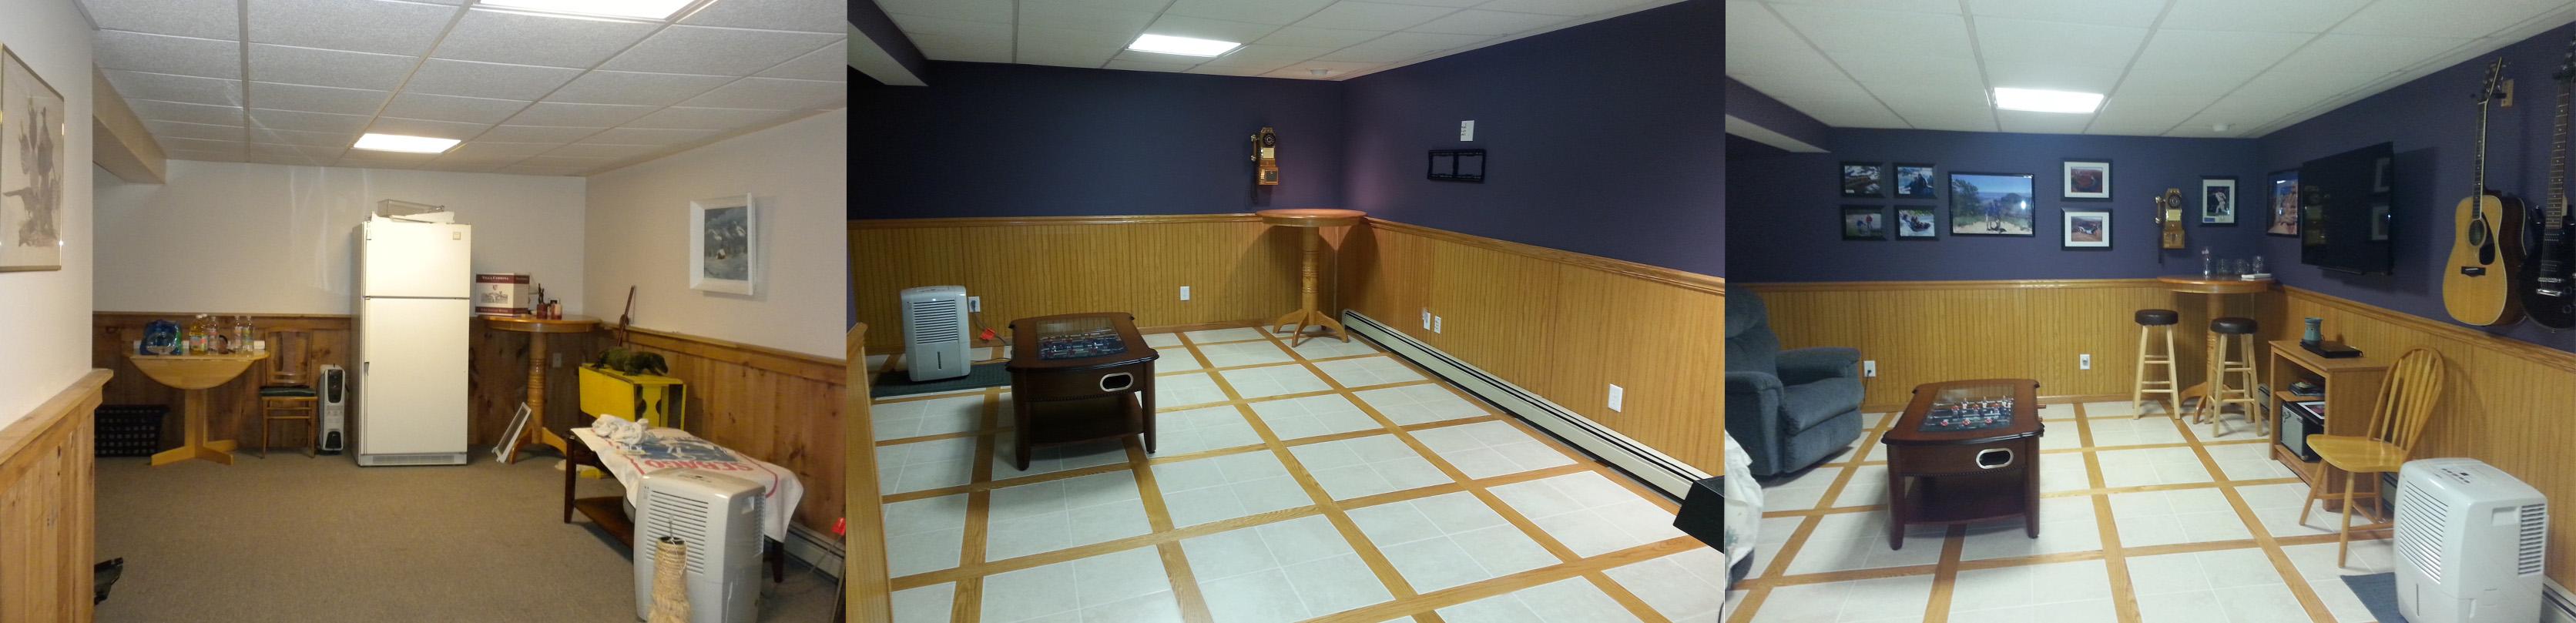 Basement Transformation Using Oak Beadboard Paneling